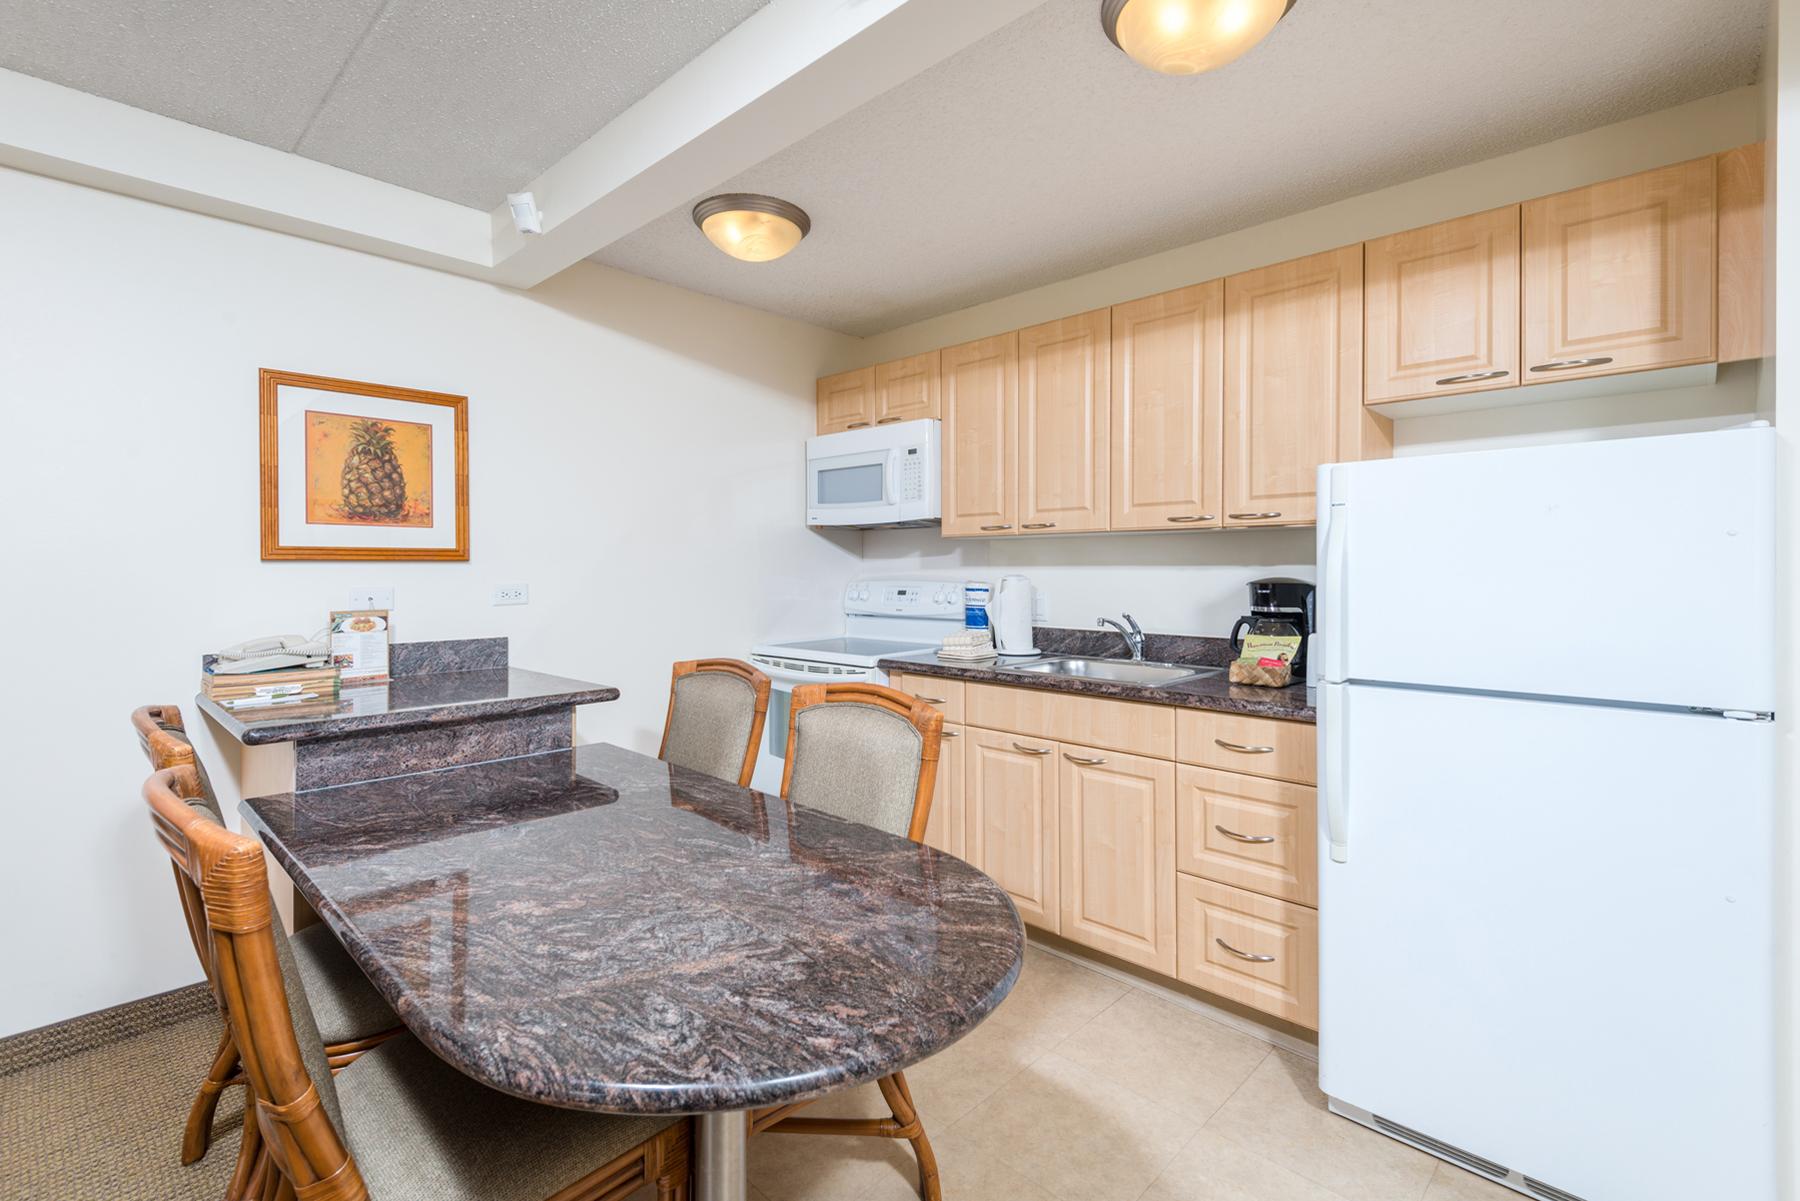 Condominium for Sale at Charming Waikiki Retreat 229 Paoakalani #1401 Honolulu, Hawaii 96815 United States